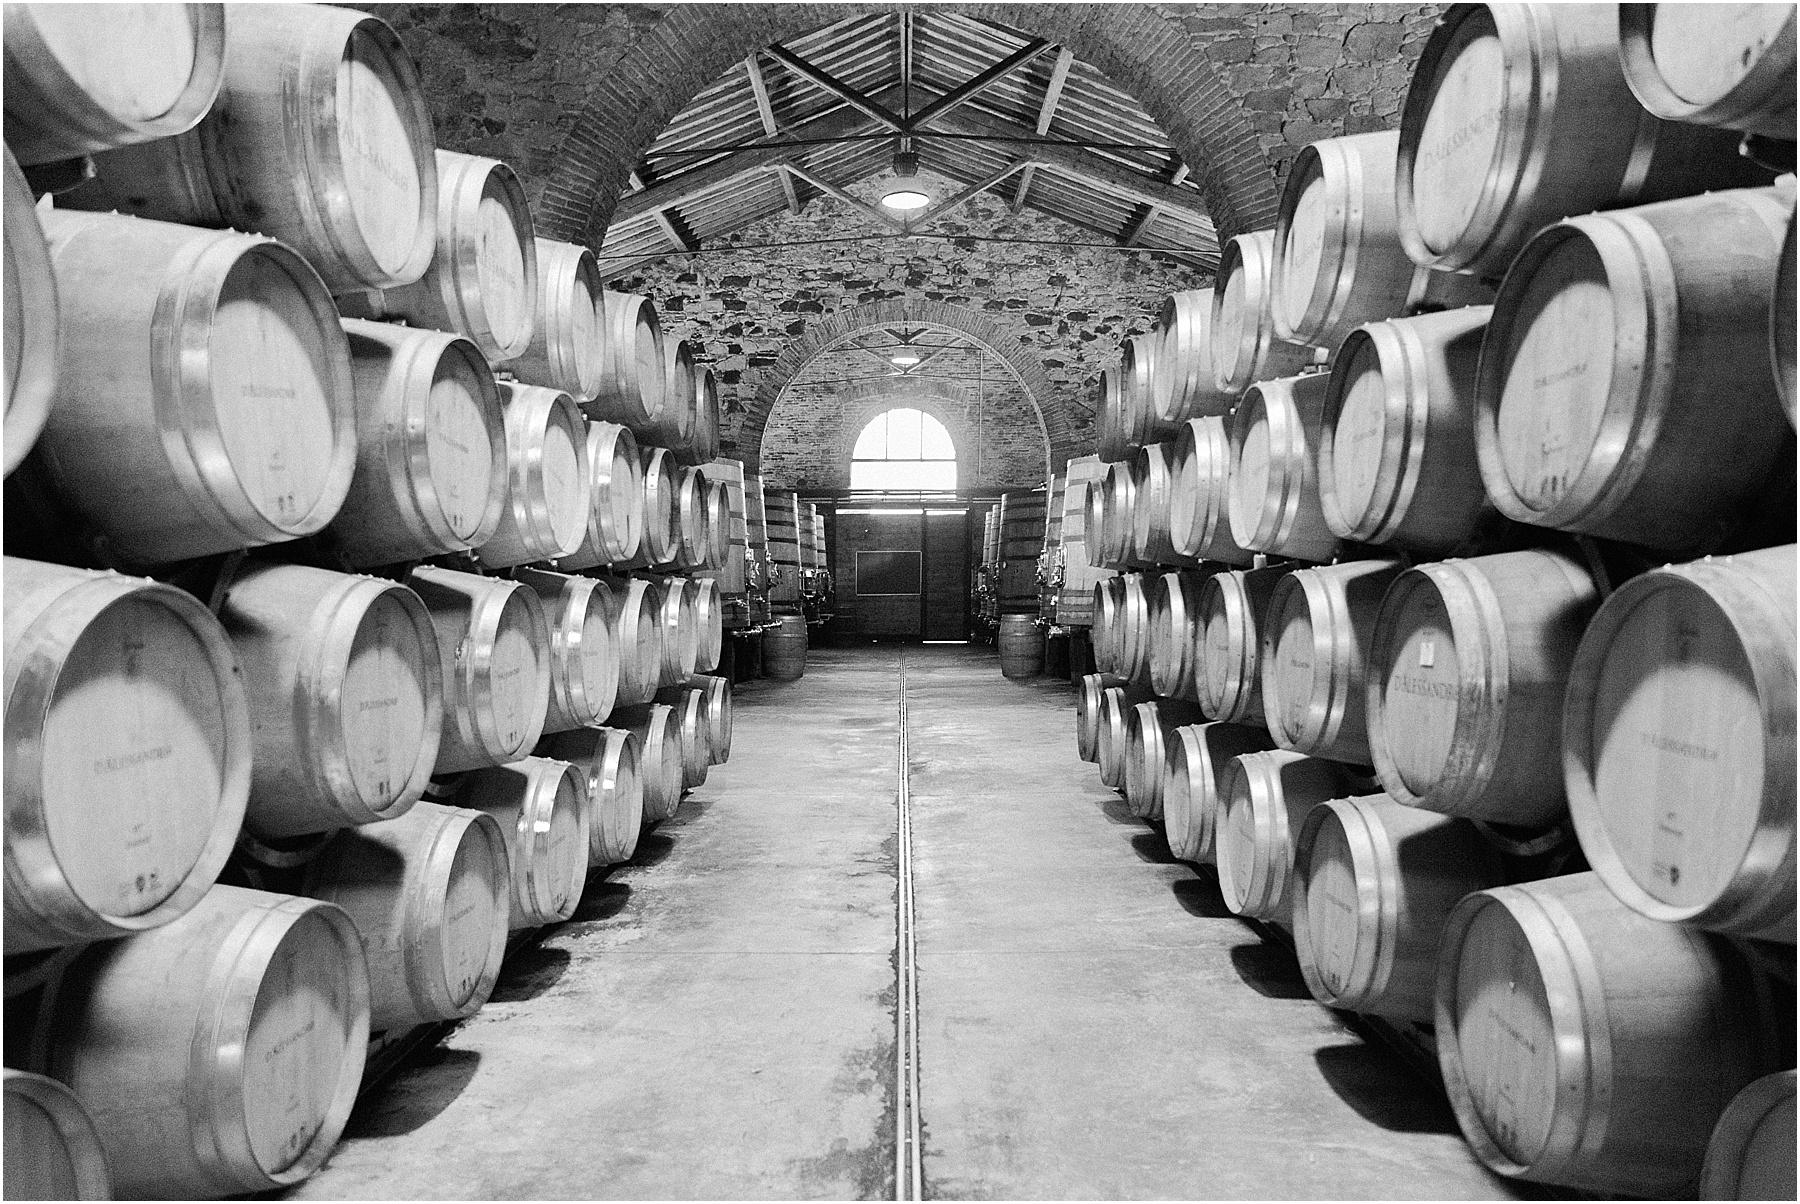 wine cellar black and white at cortona winery vineyard tenimenti d'alessandro osteria borgo syrah